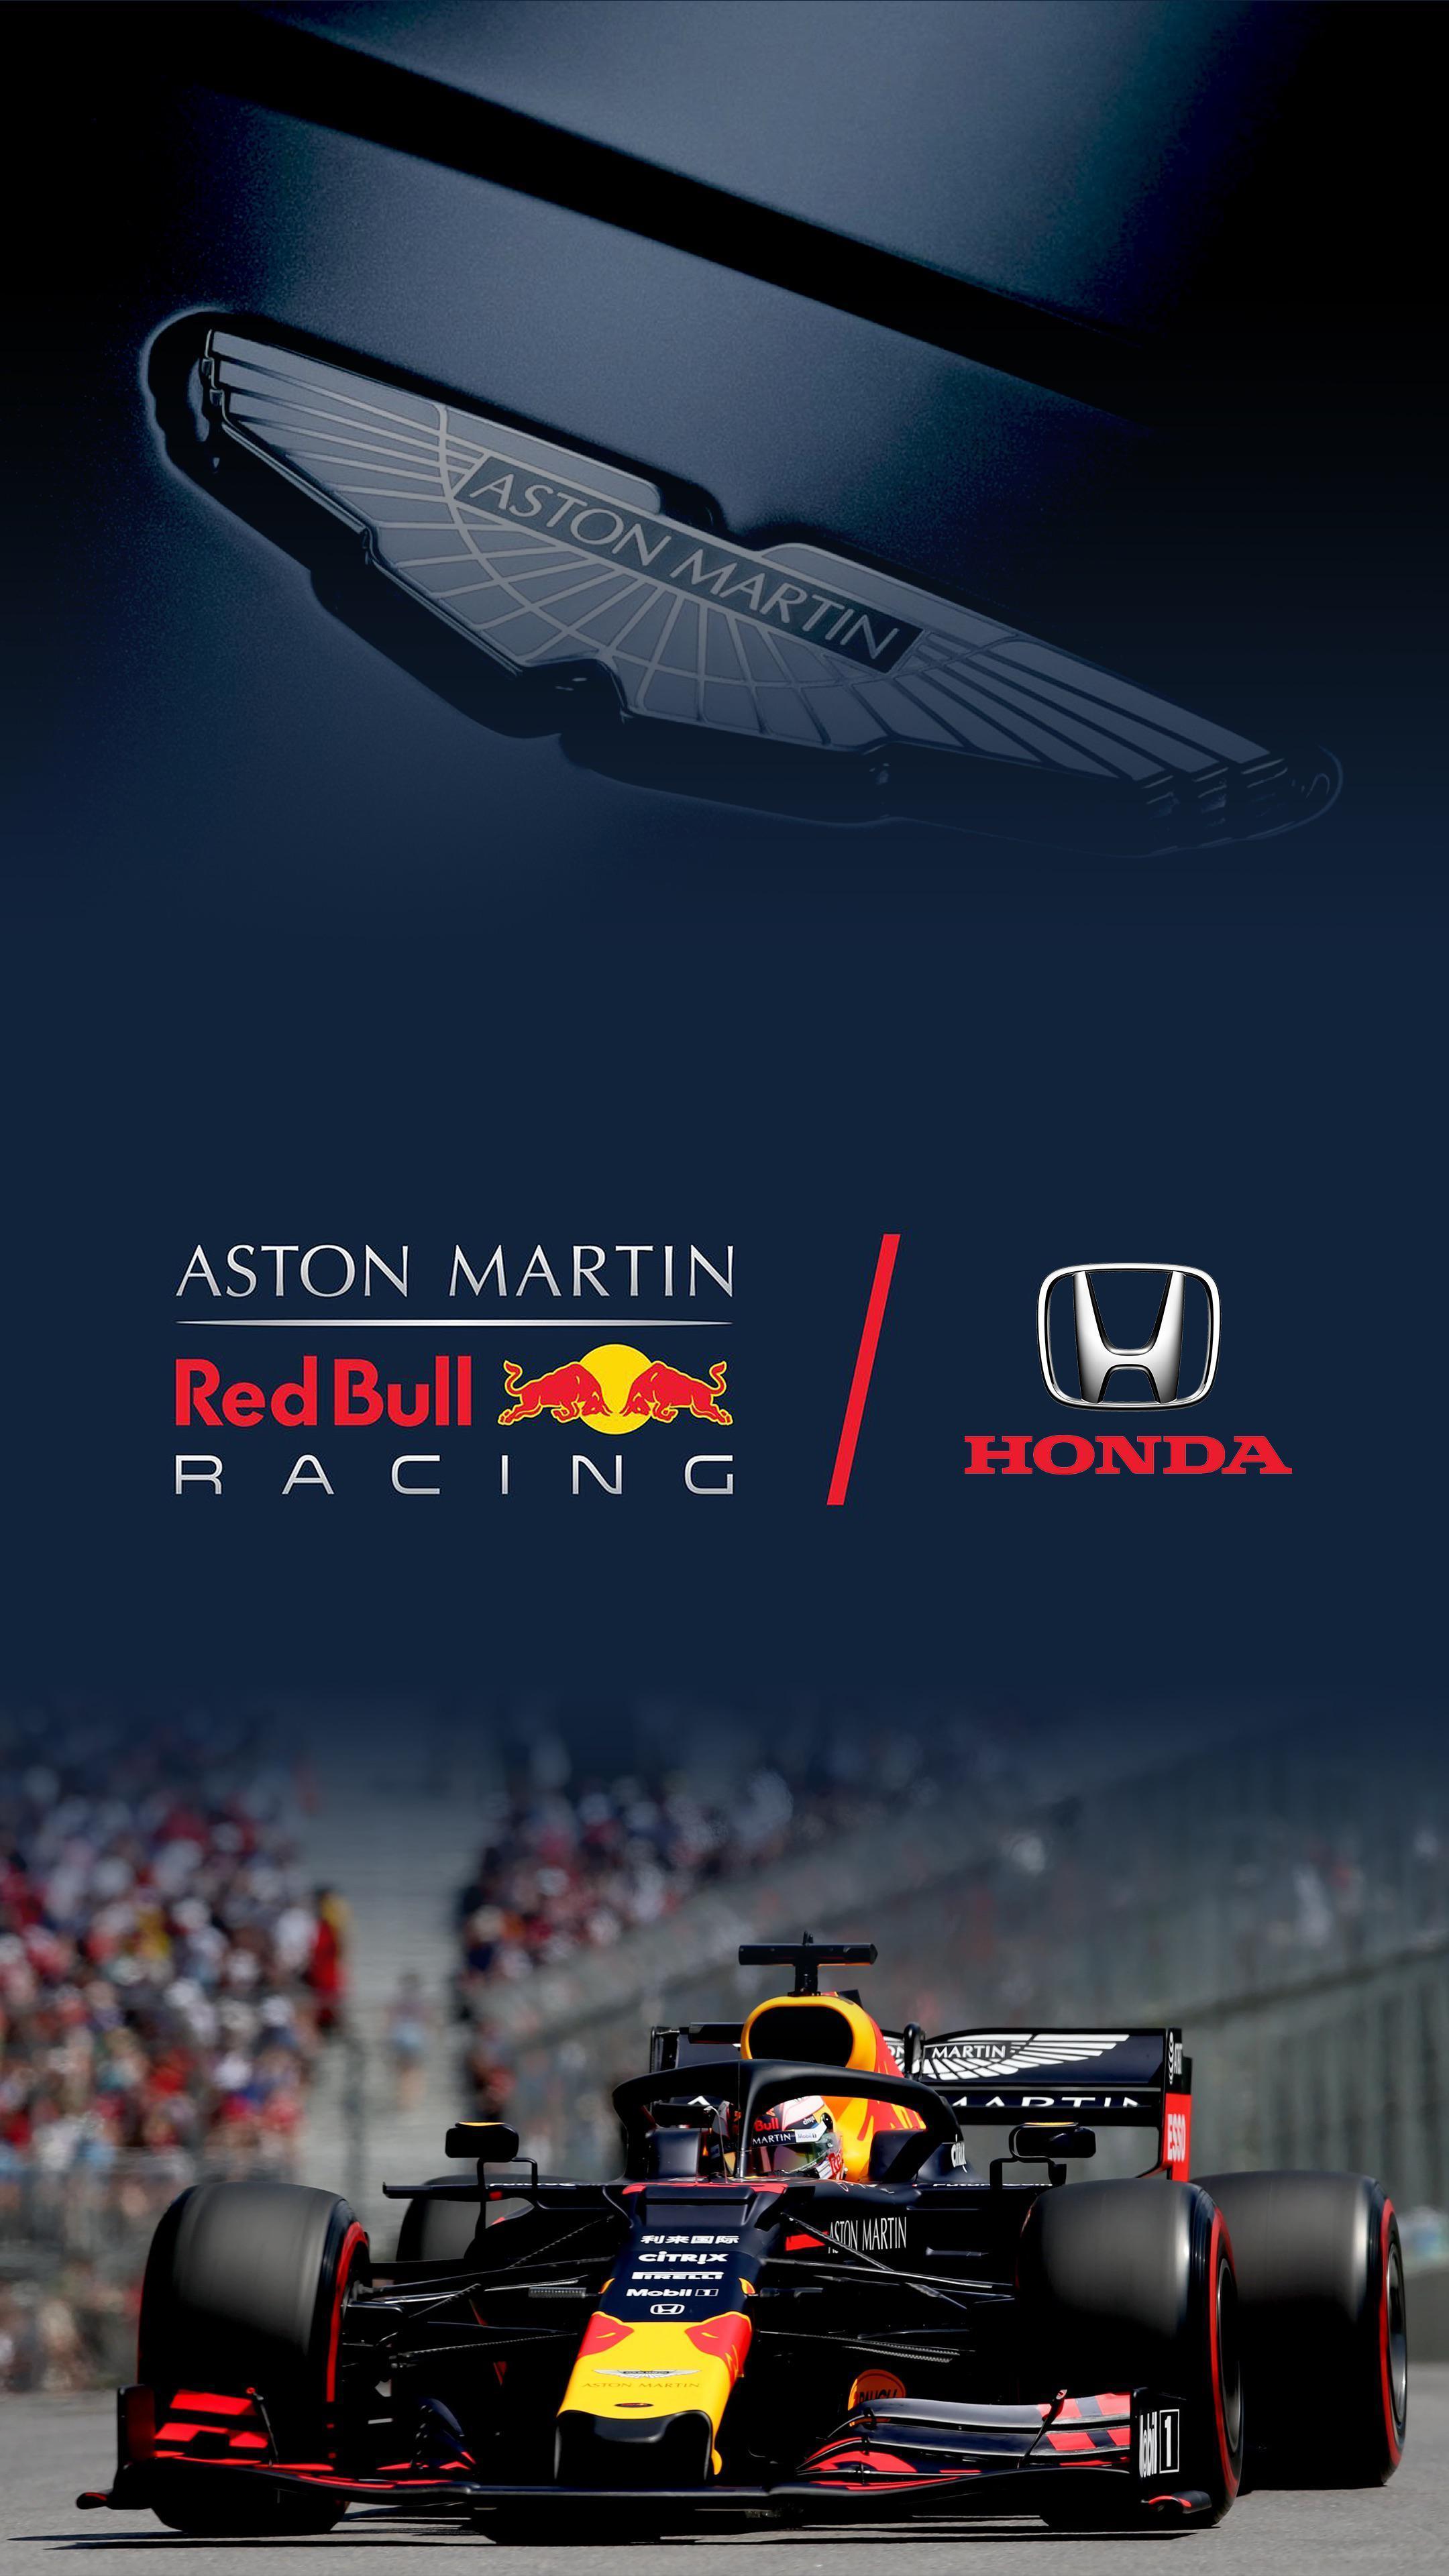 Aston Martin Red Bull Racing Wallpapers Top Free Aston Martin Red Bull Racing Backgrounds Wallpaperaccess